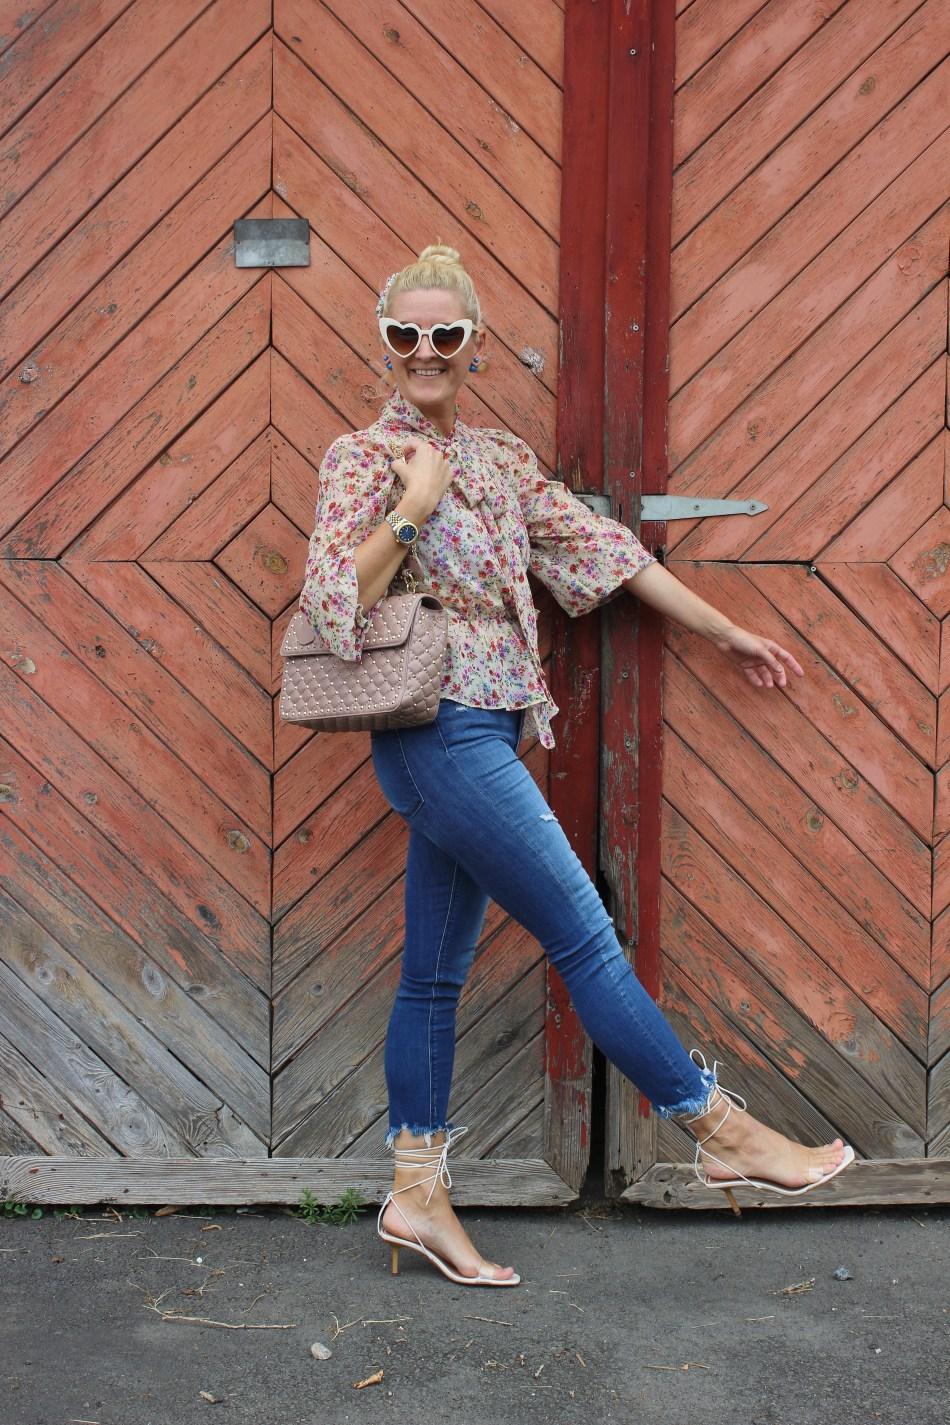 Blumenprint-Bluse-Fringed-Jeans-Strappy-Heels-YSL-Heart-Sunglasses-carrieslifestyle-TAmara-Prutsch